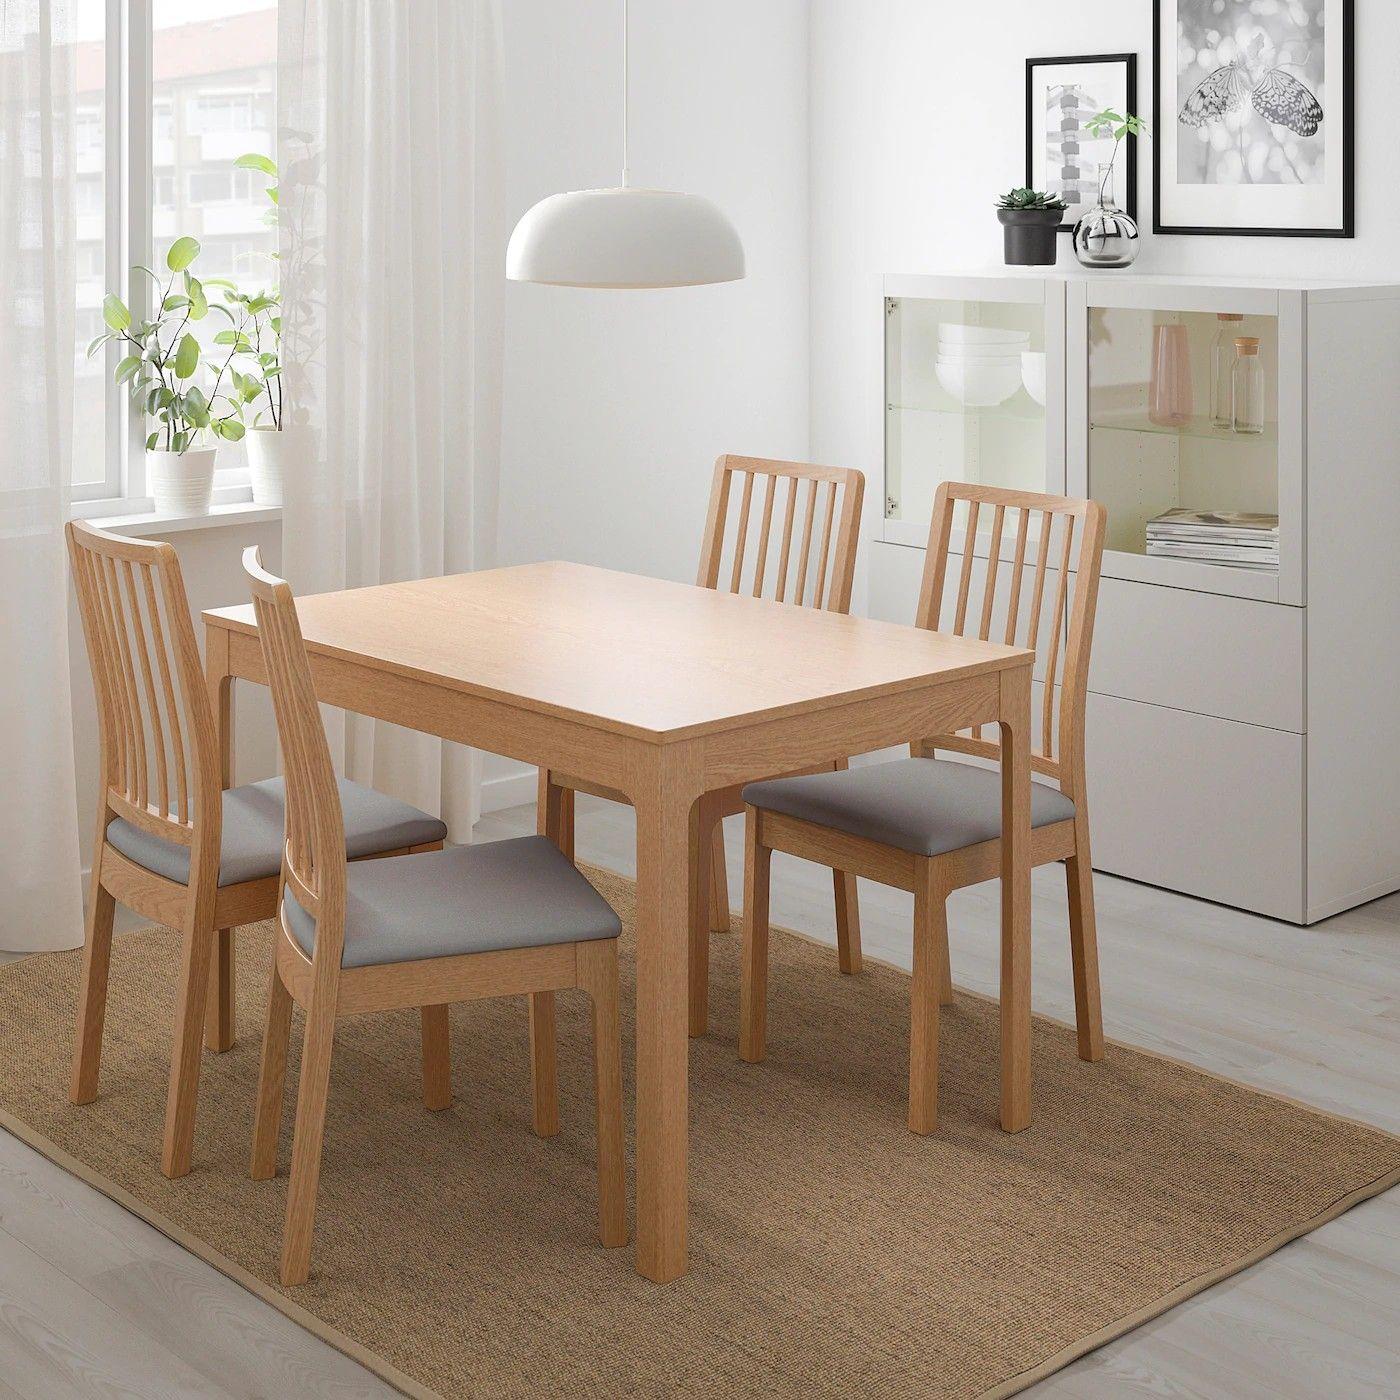 Pin By M Saravana On Neue Wohnung 2020 In 2020 Dining Room Small Ikea Ikea Sofa Set